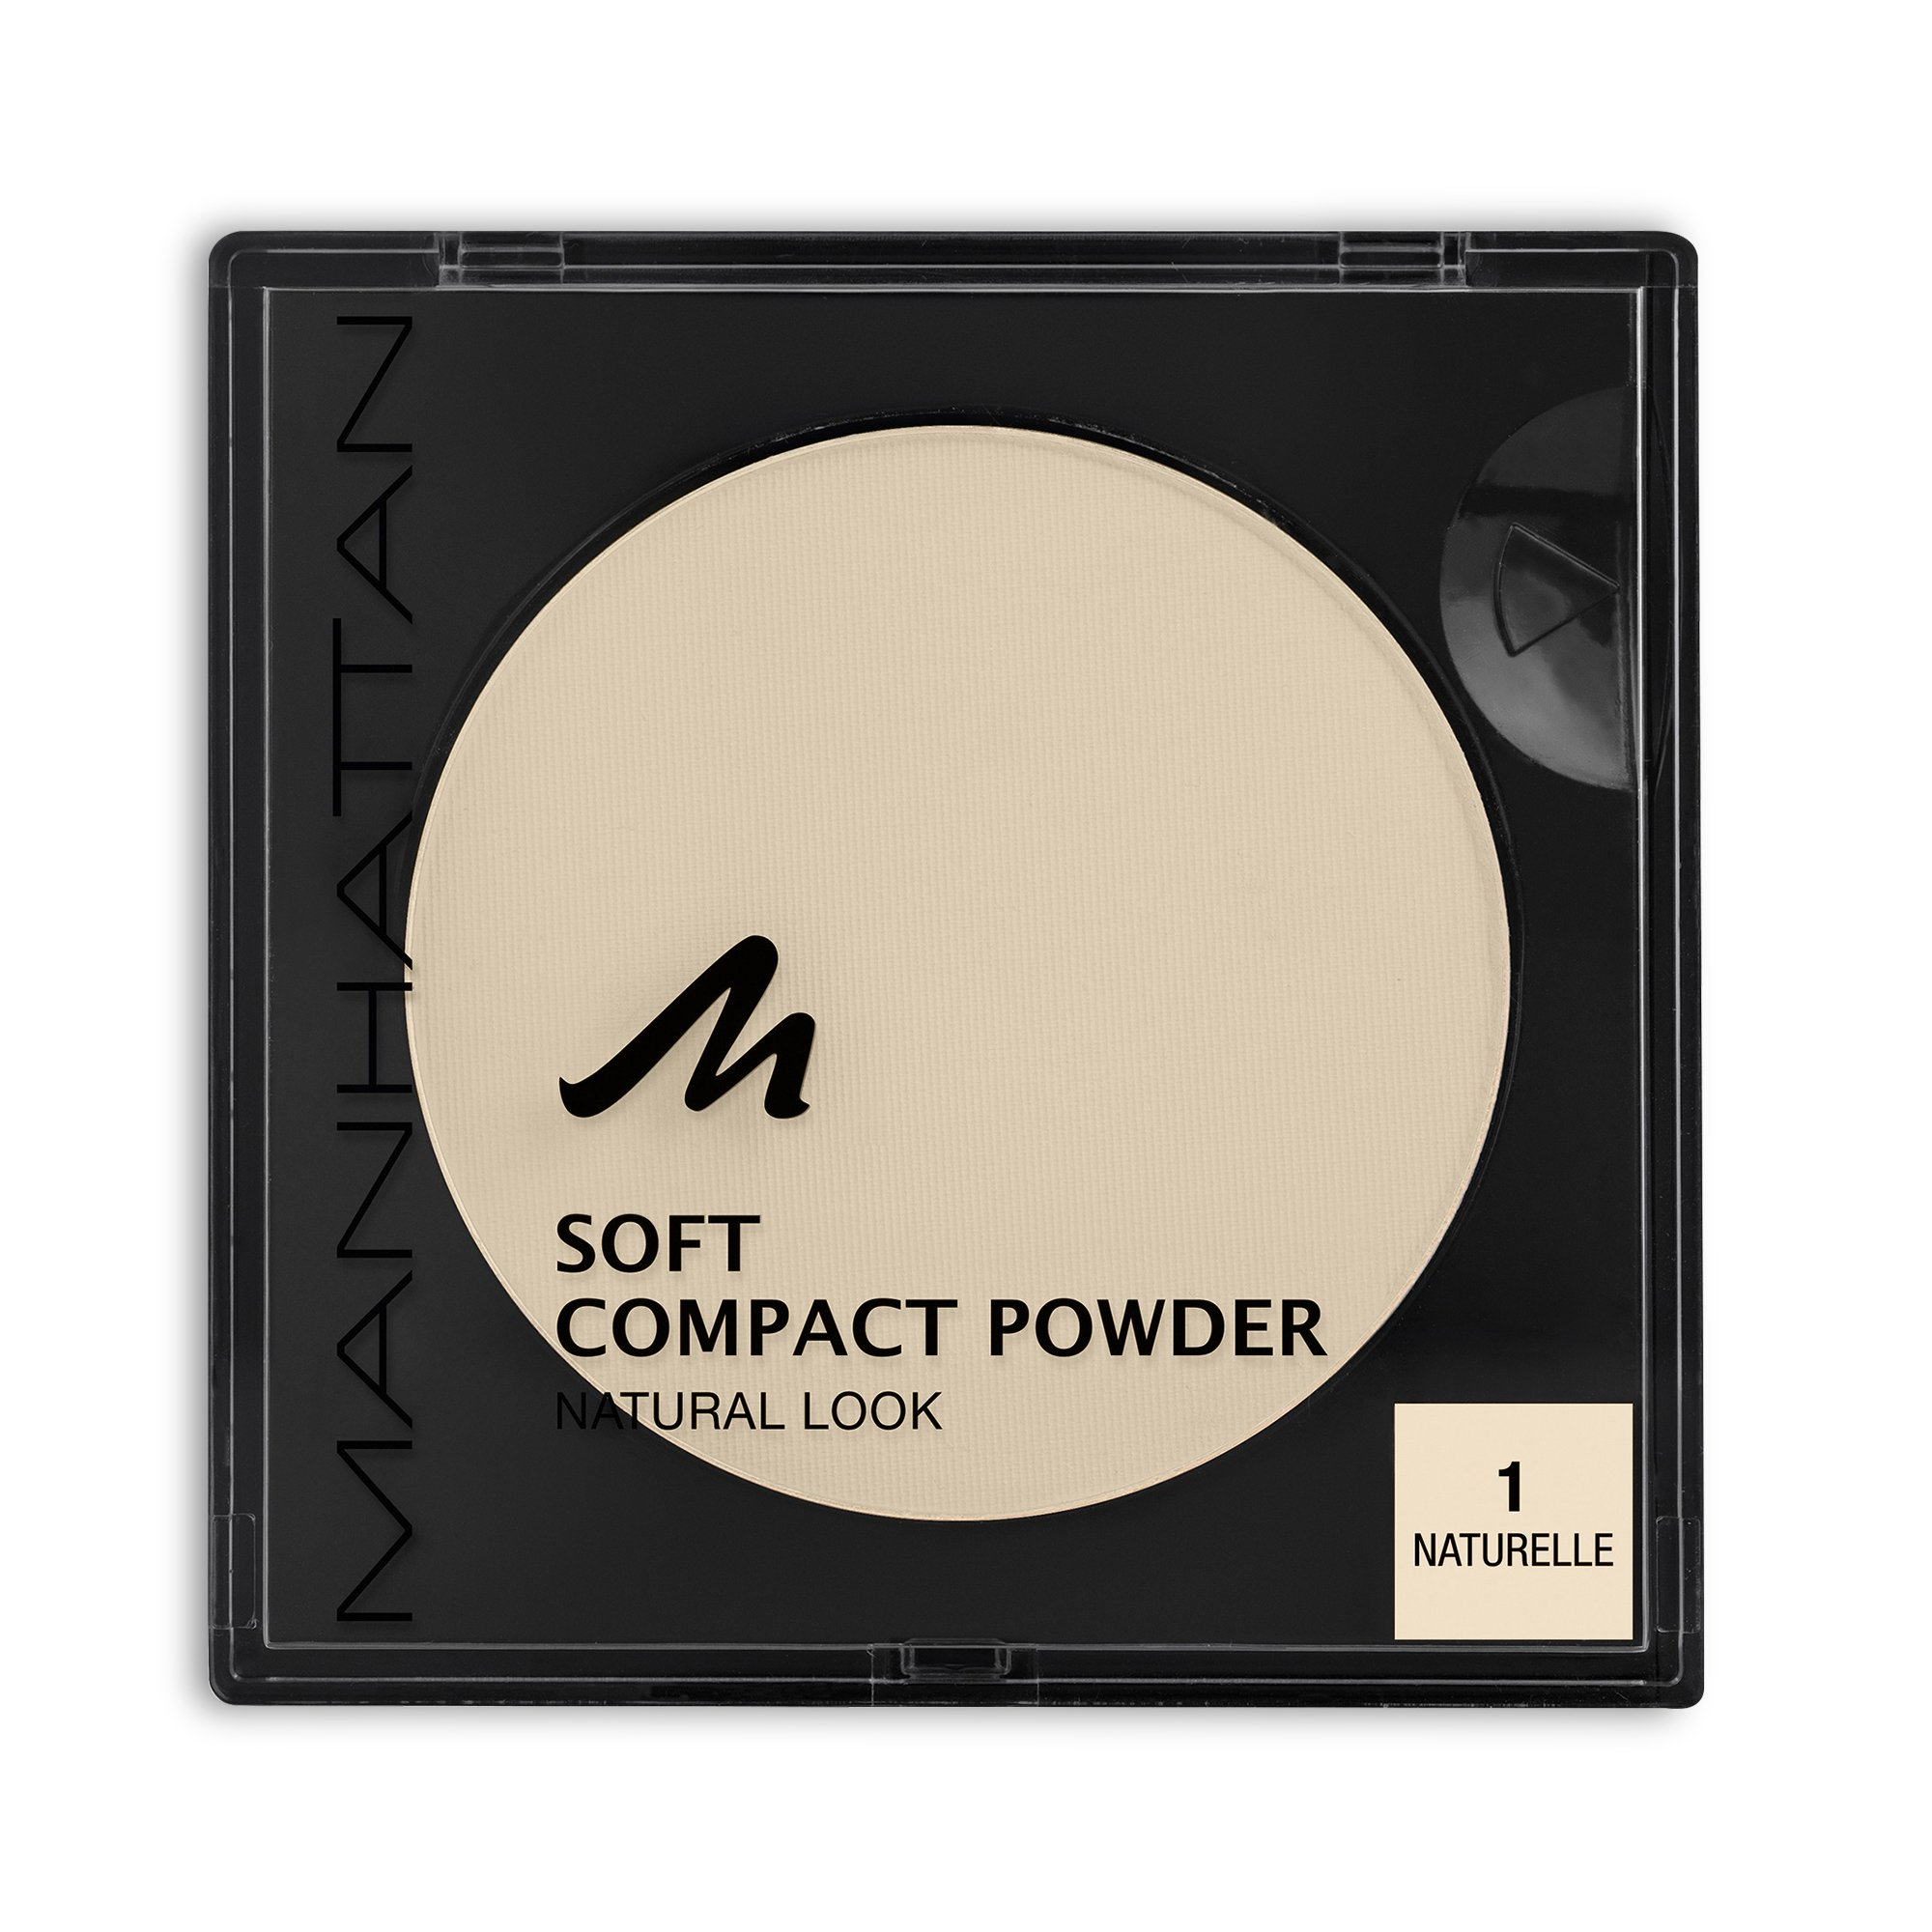 Manhattan 16918 Soft Compact Powder 1, naturelle product image